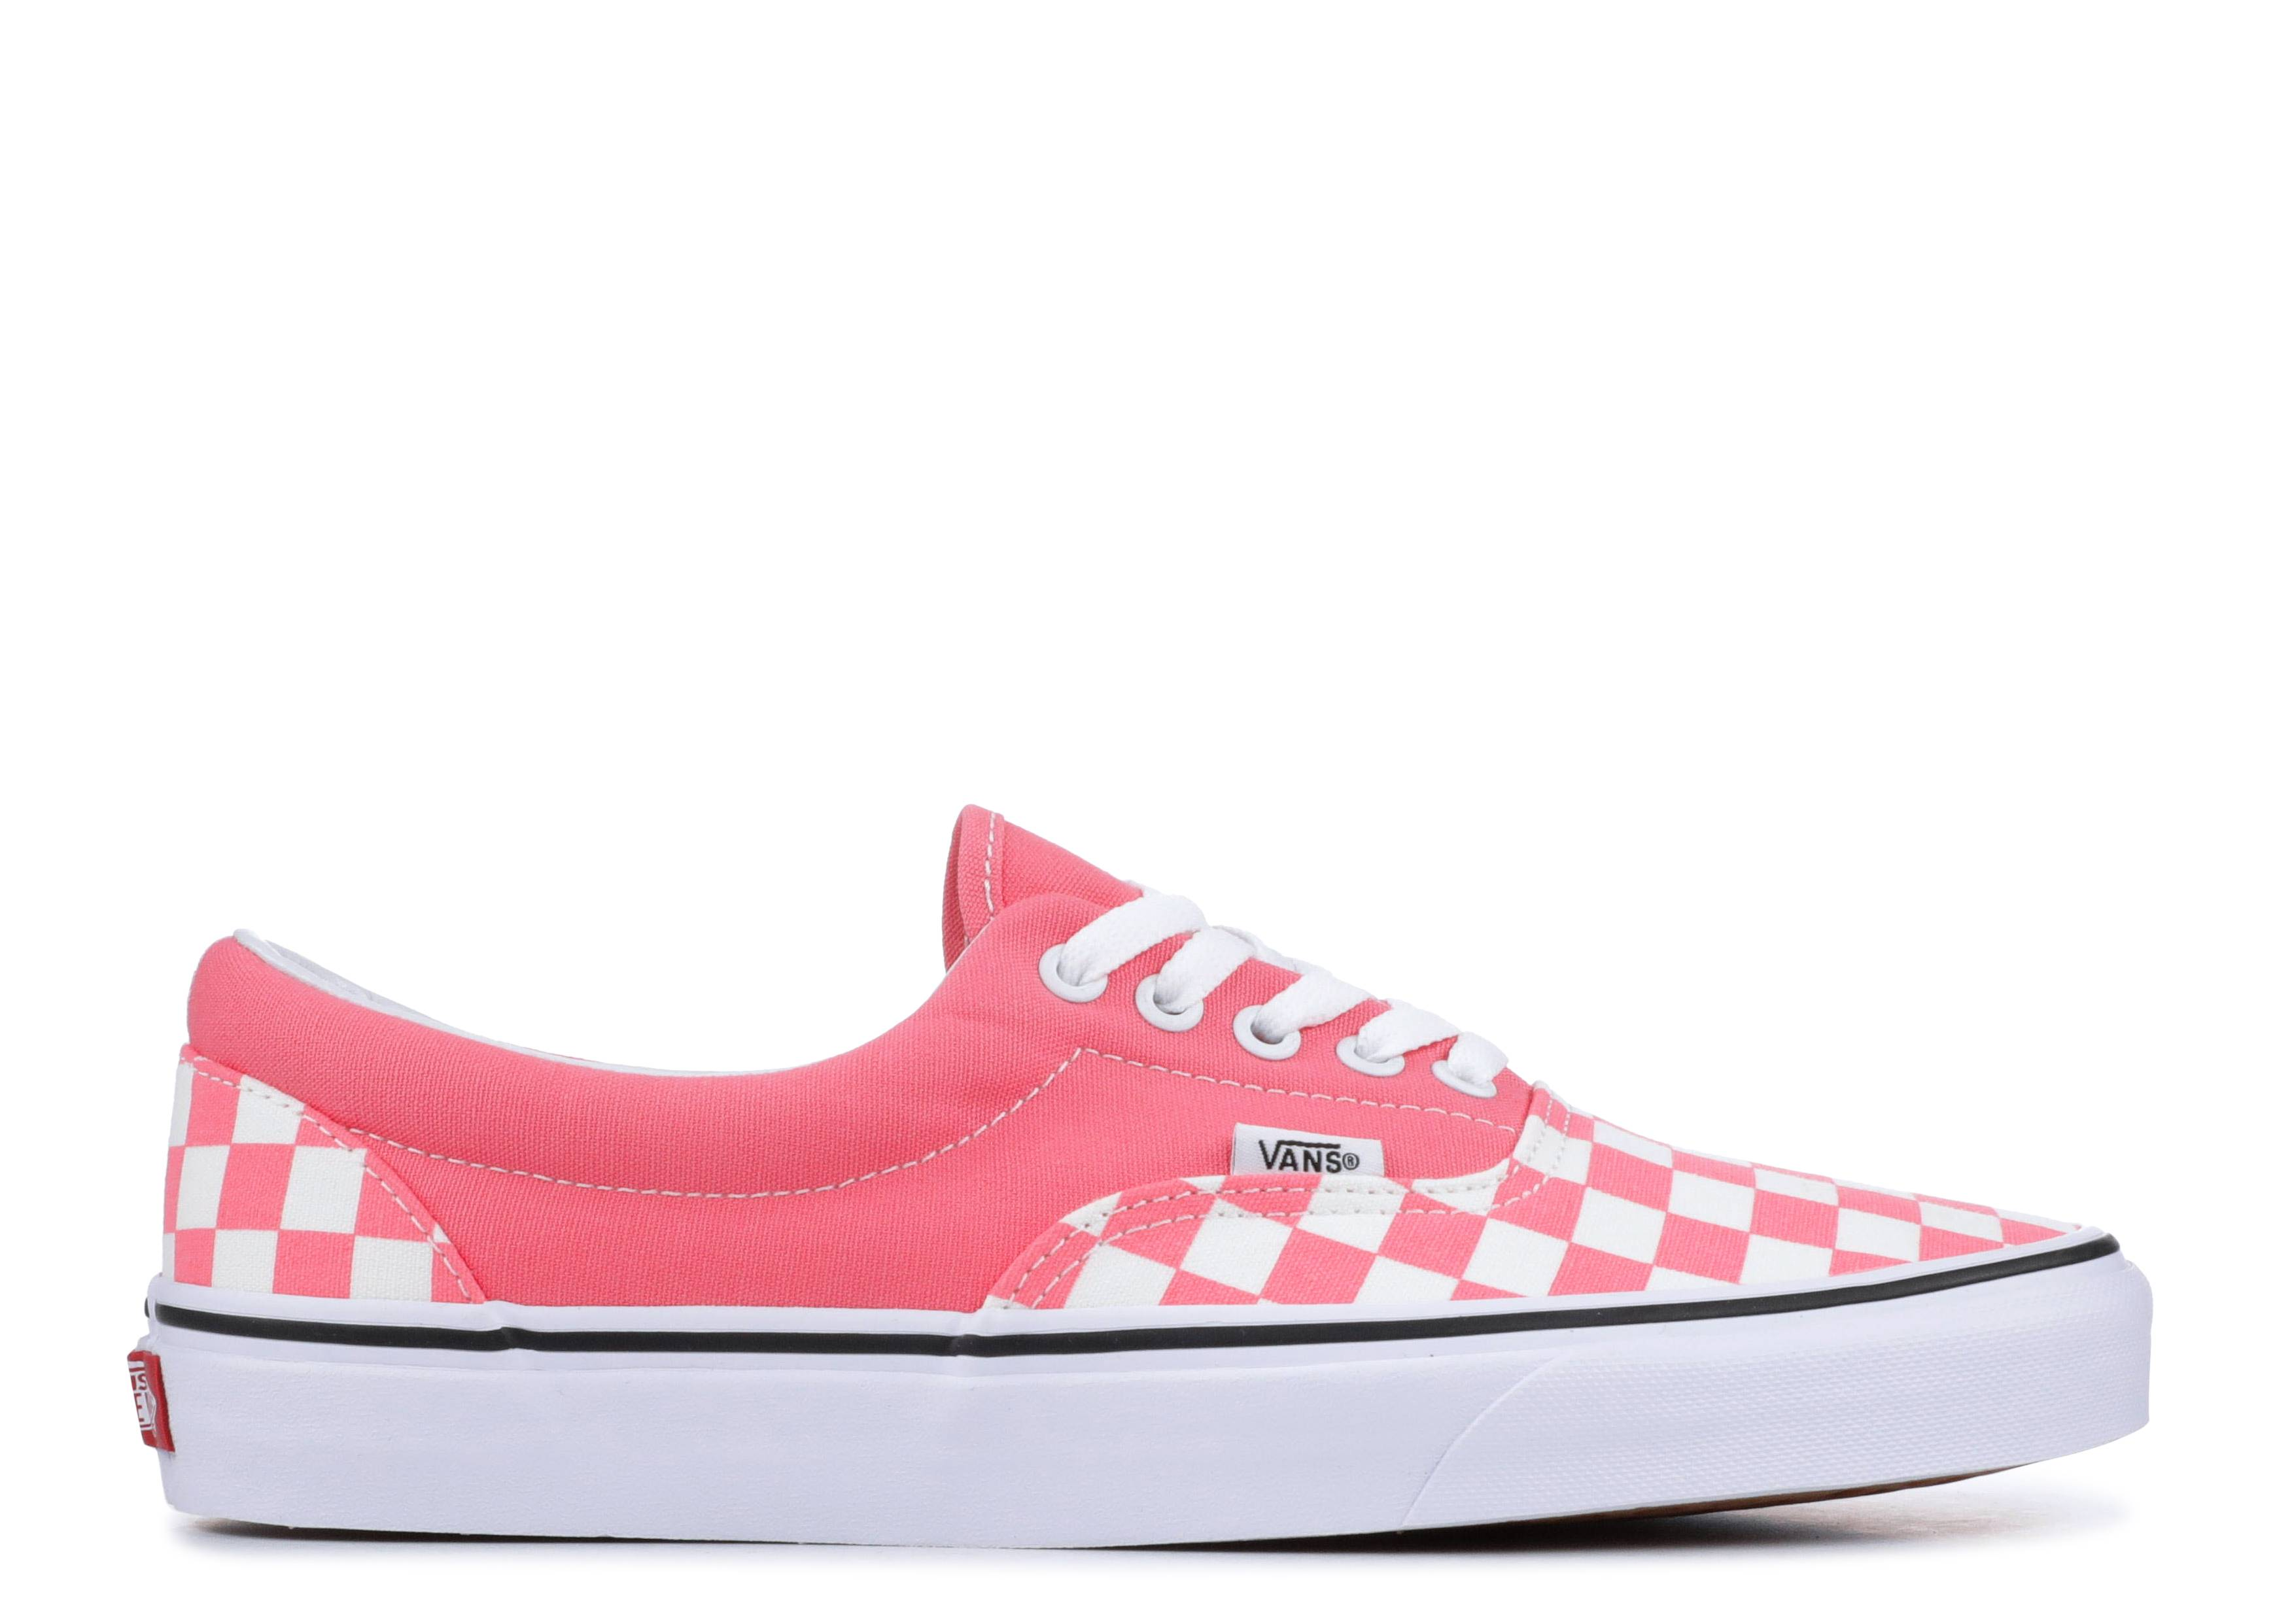 vans strawberry